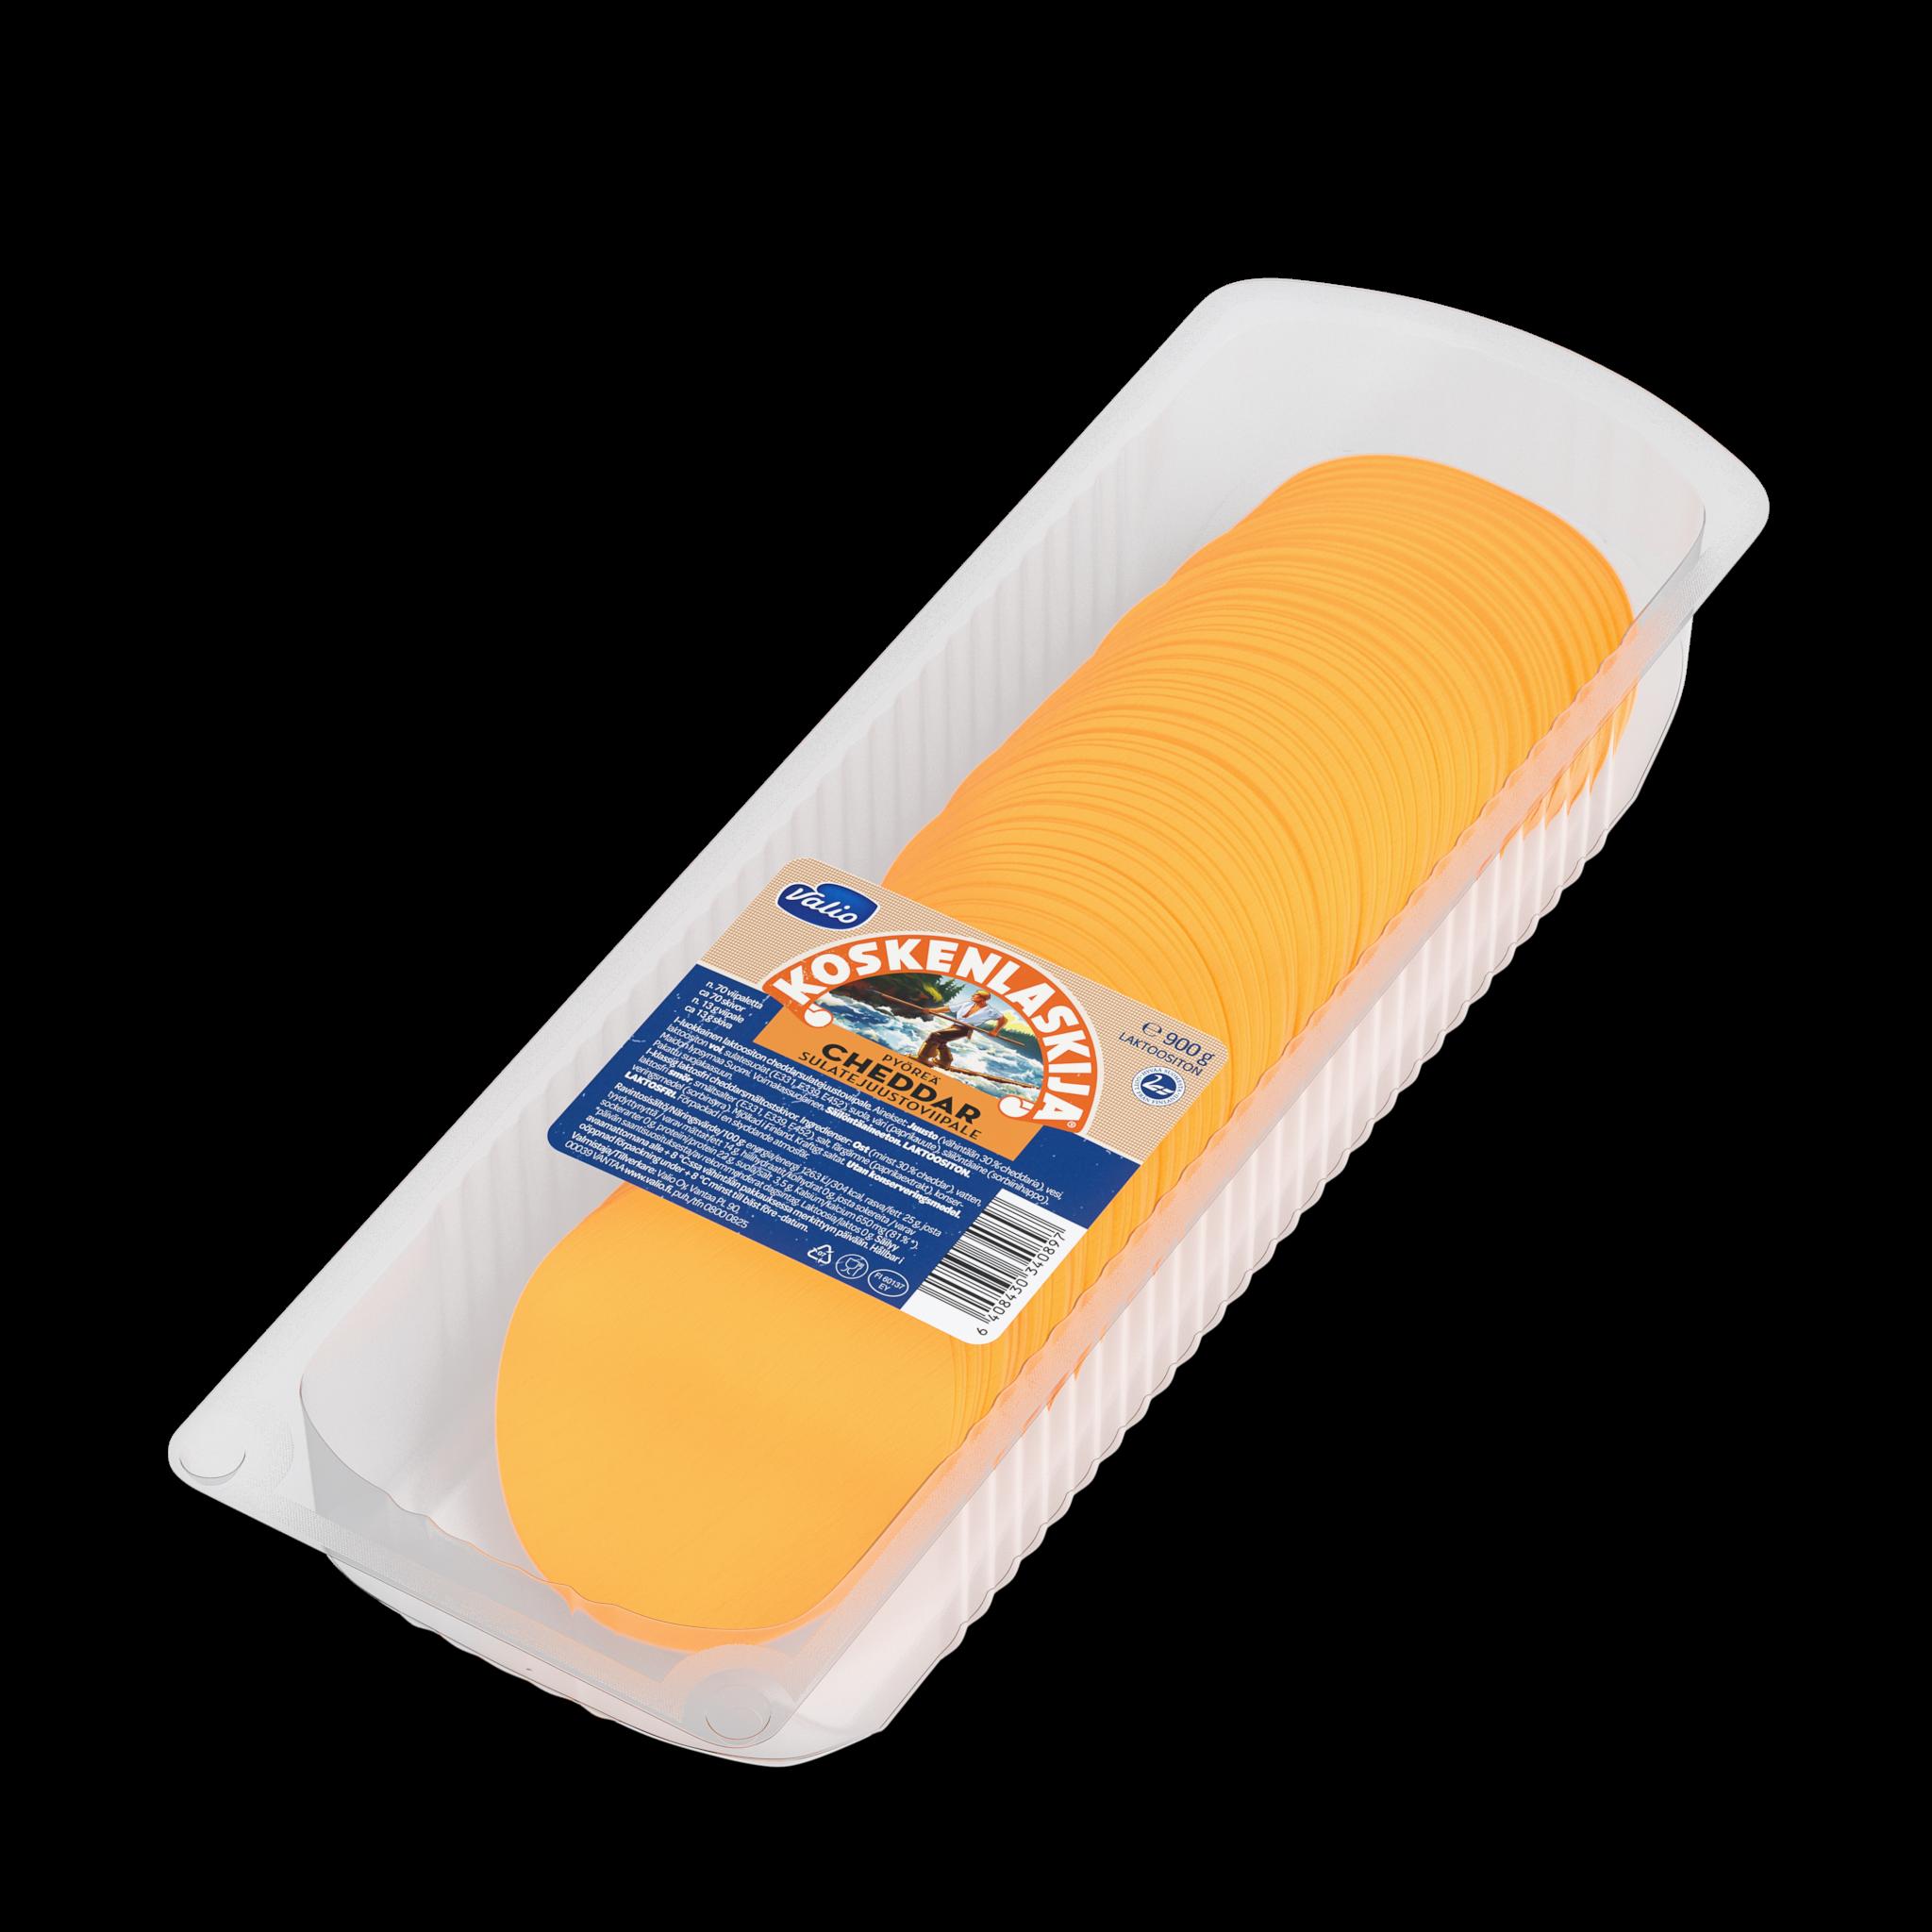 Cheddar sulatejuustoviipale